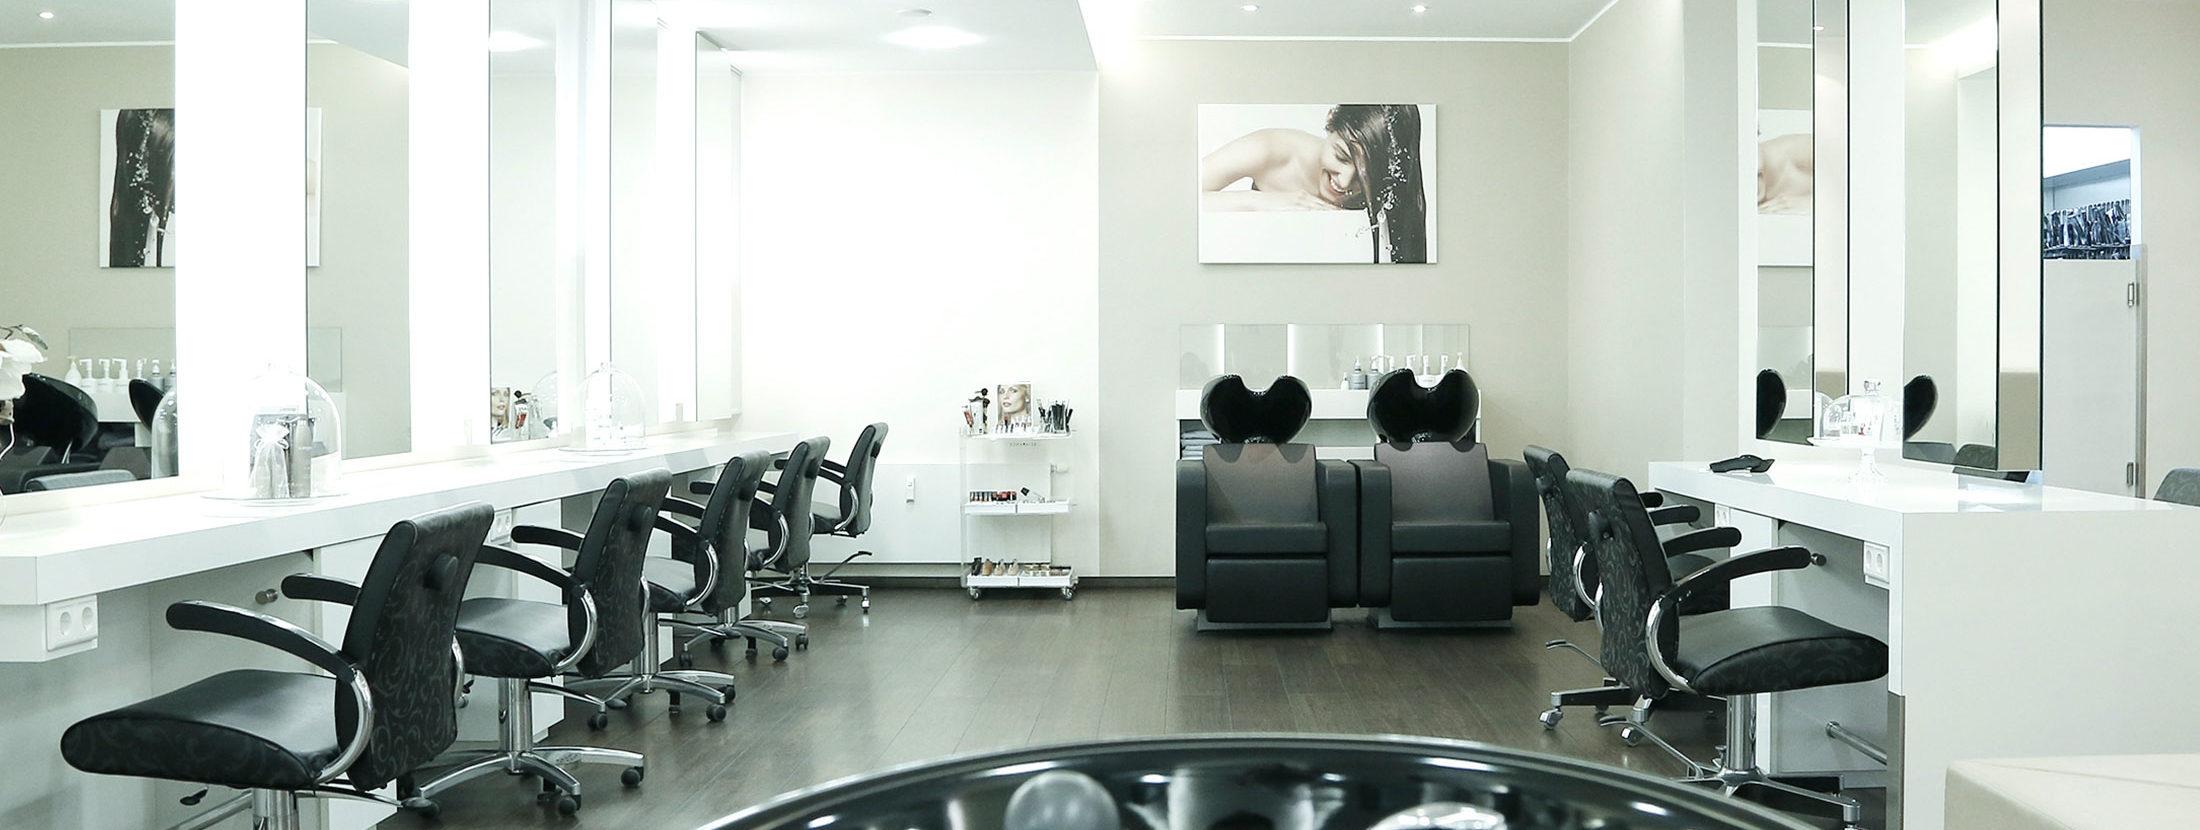 Friseursalon Georgsmarienhütte - Friseure, Kosmetik ...